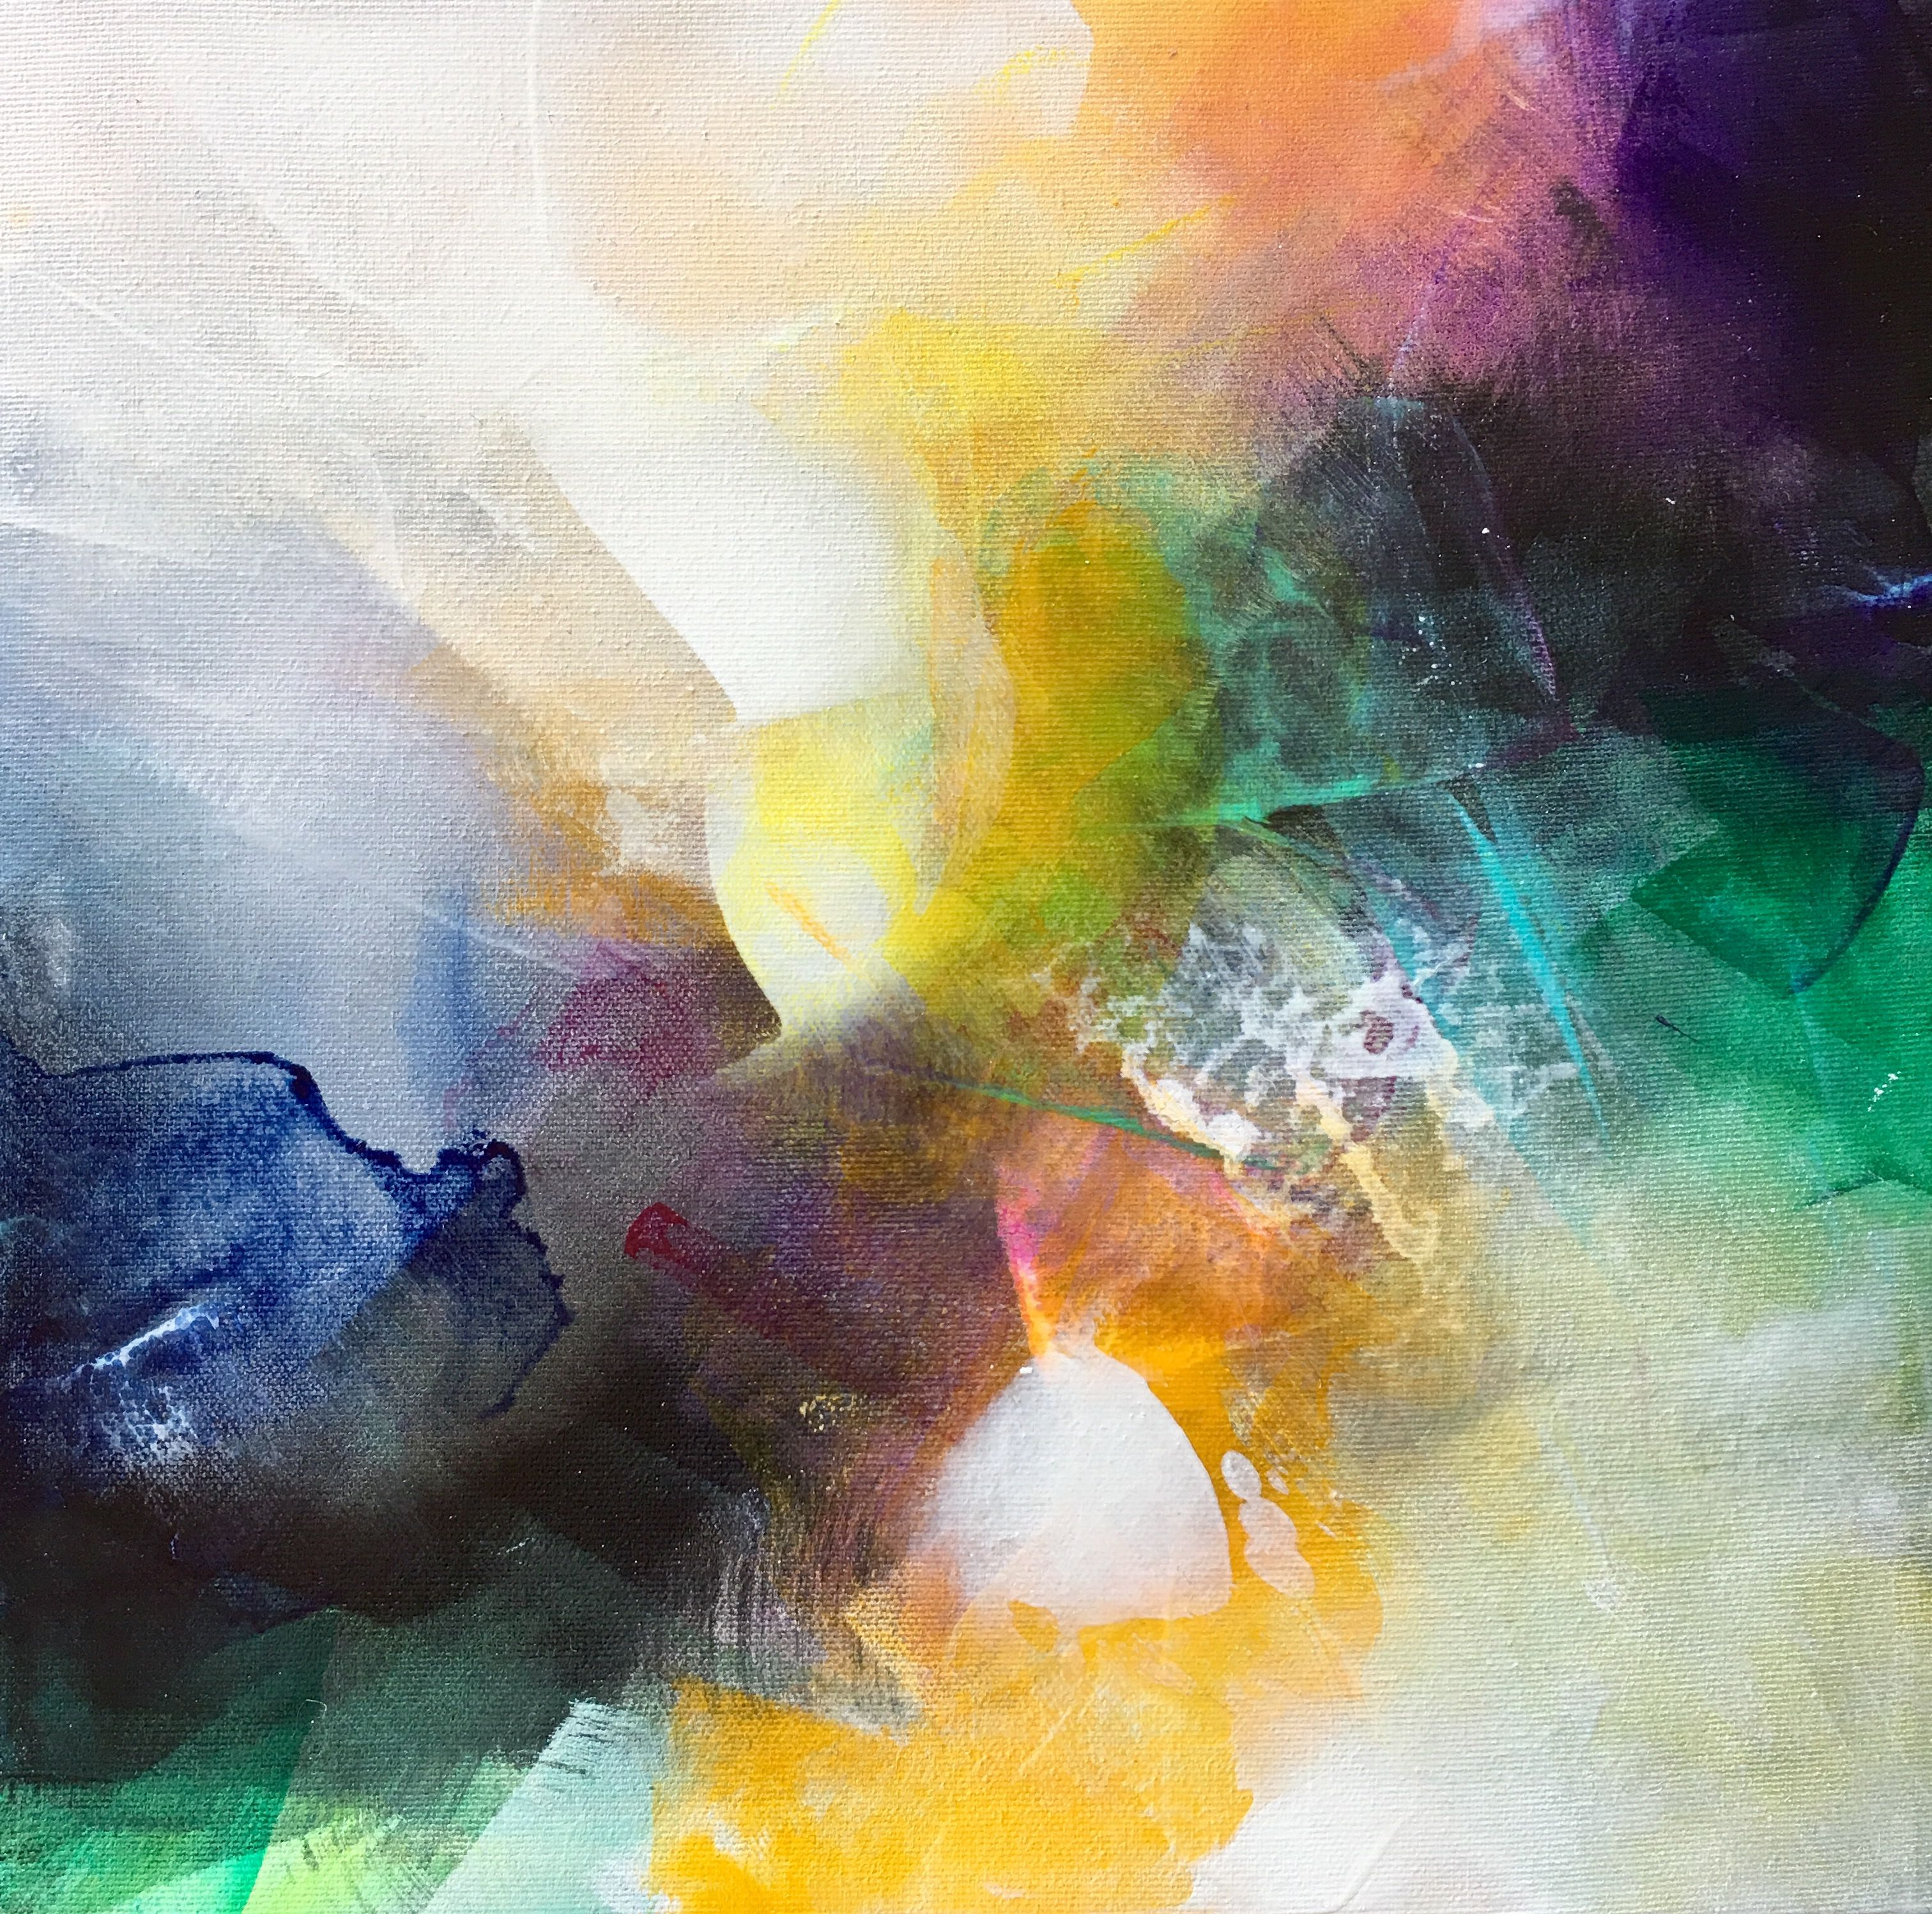 Mini Abstract Painting Joyful Thoughts 6 12x12 Acrylic On